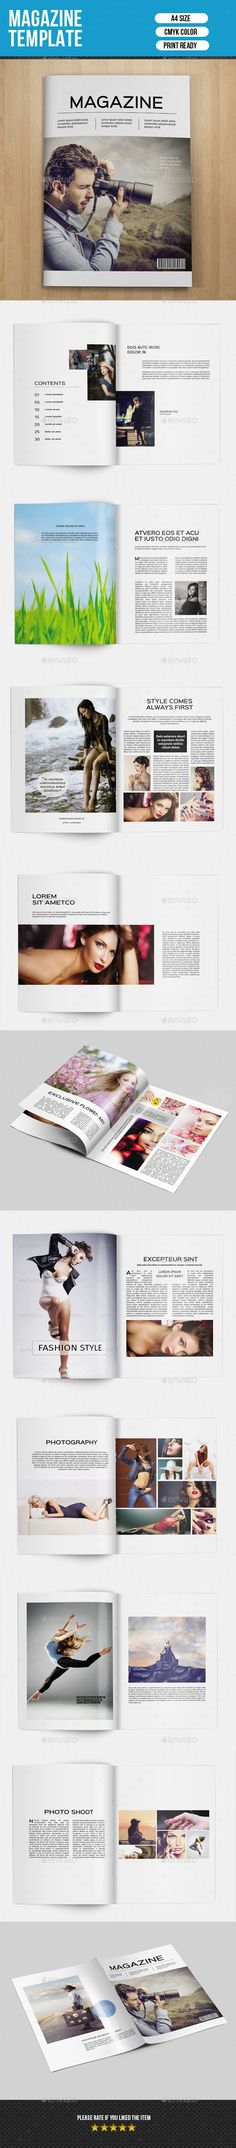 Minimal #Magazine Template-V01 - Magazines Print #Templates Download here: https://graphicriver.net/item/minimal-magazine-templatev01/9291042?ref=alena994